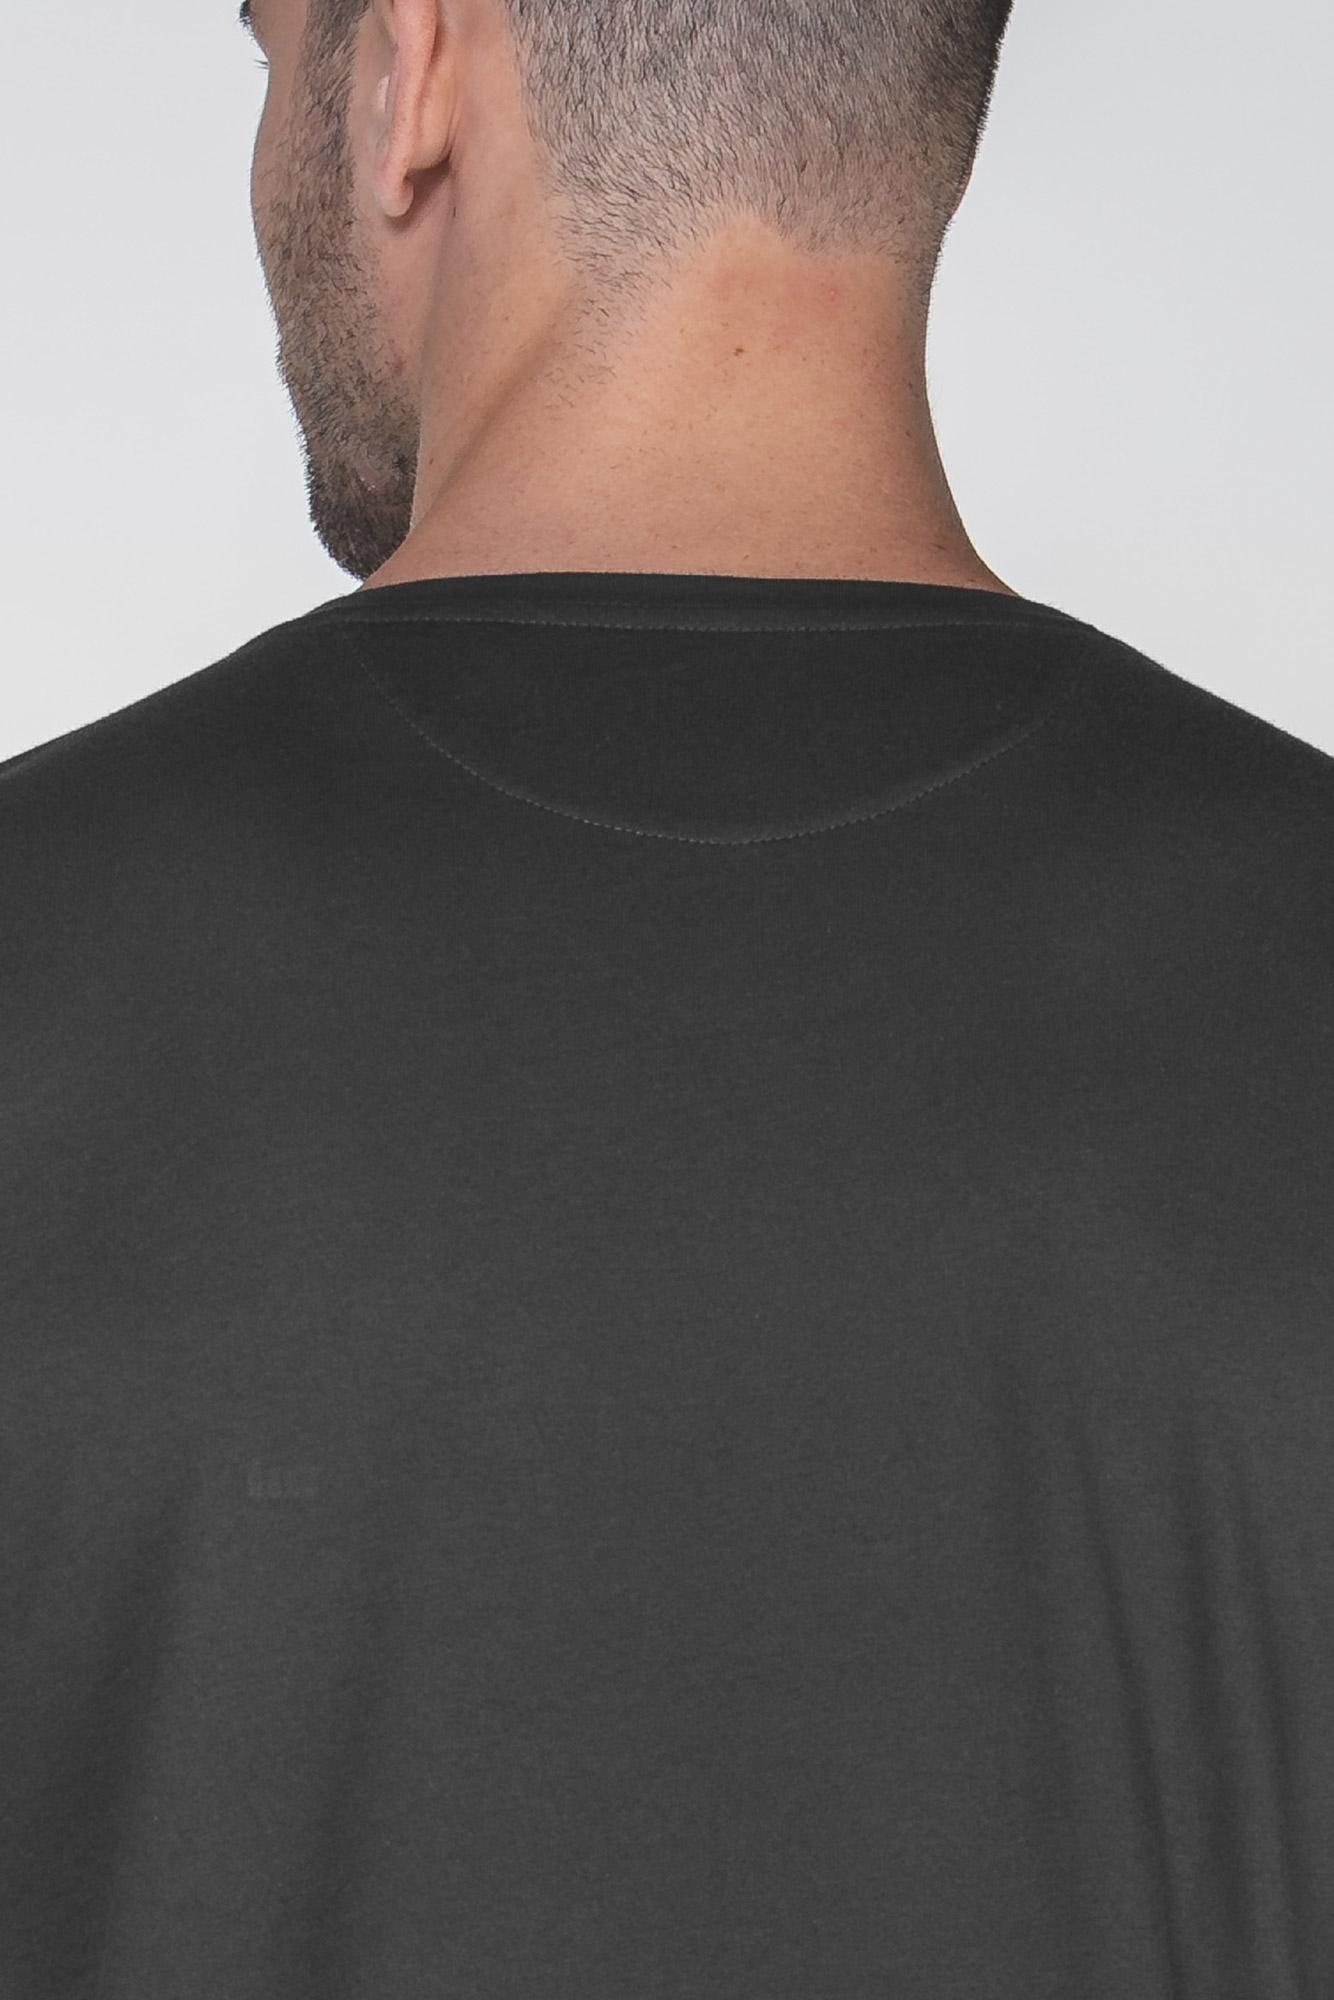 Camiseta Egypt Simple V Preta